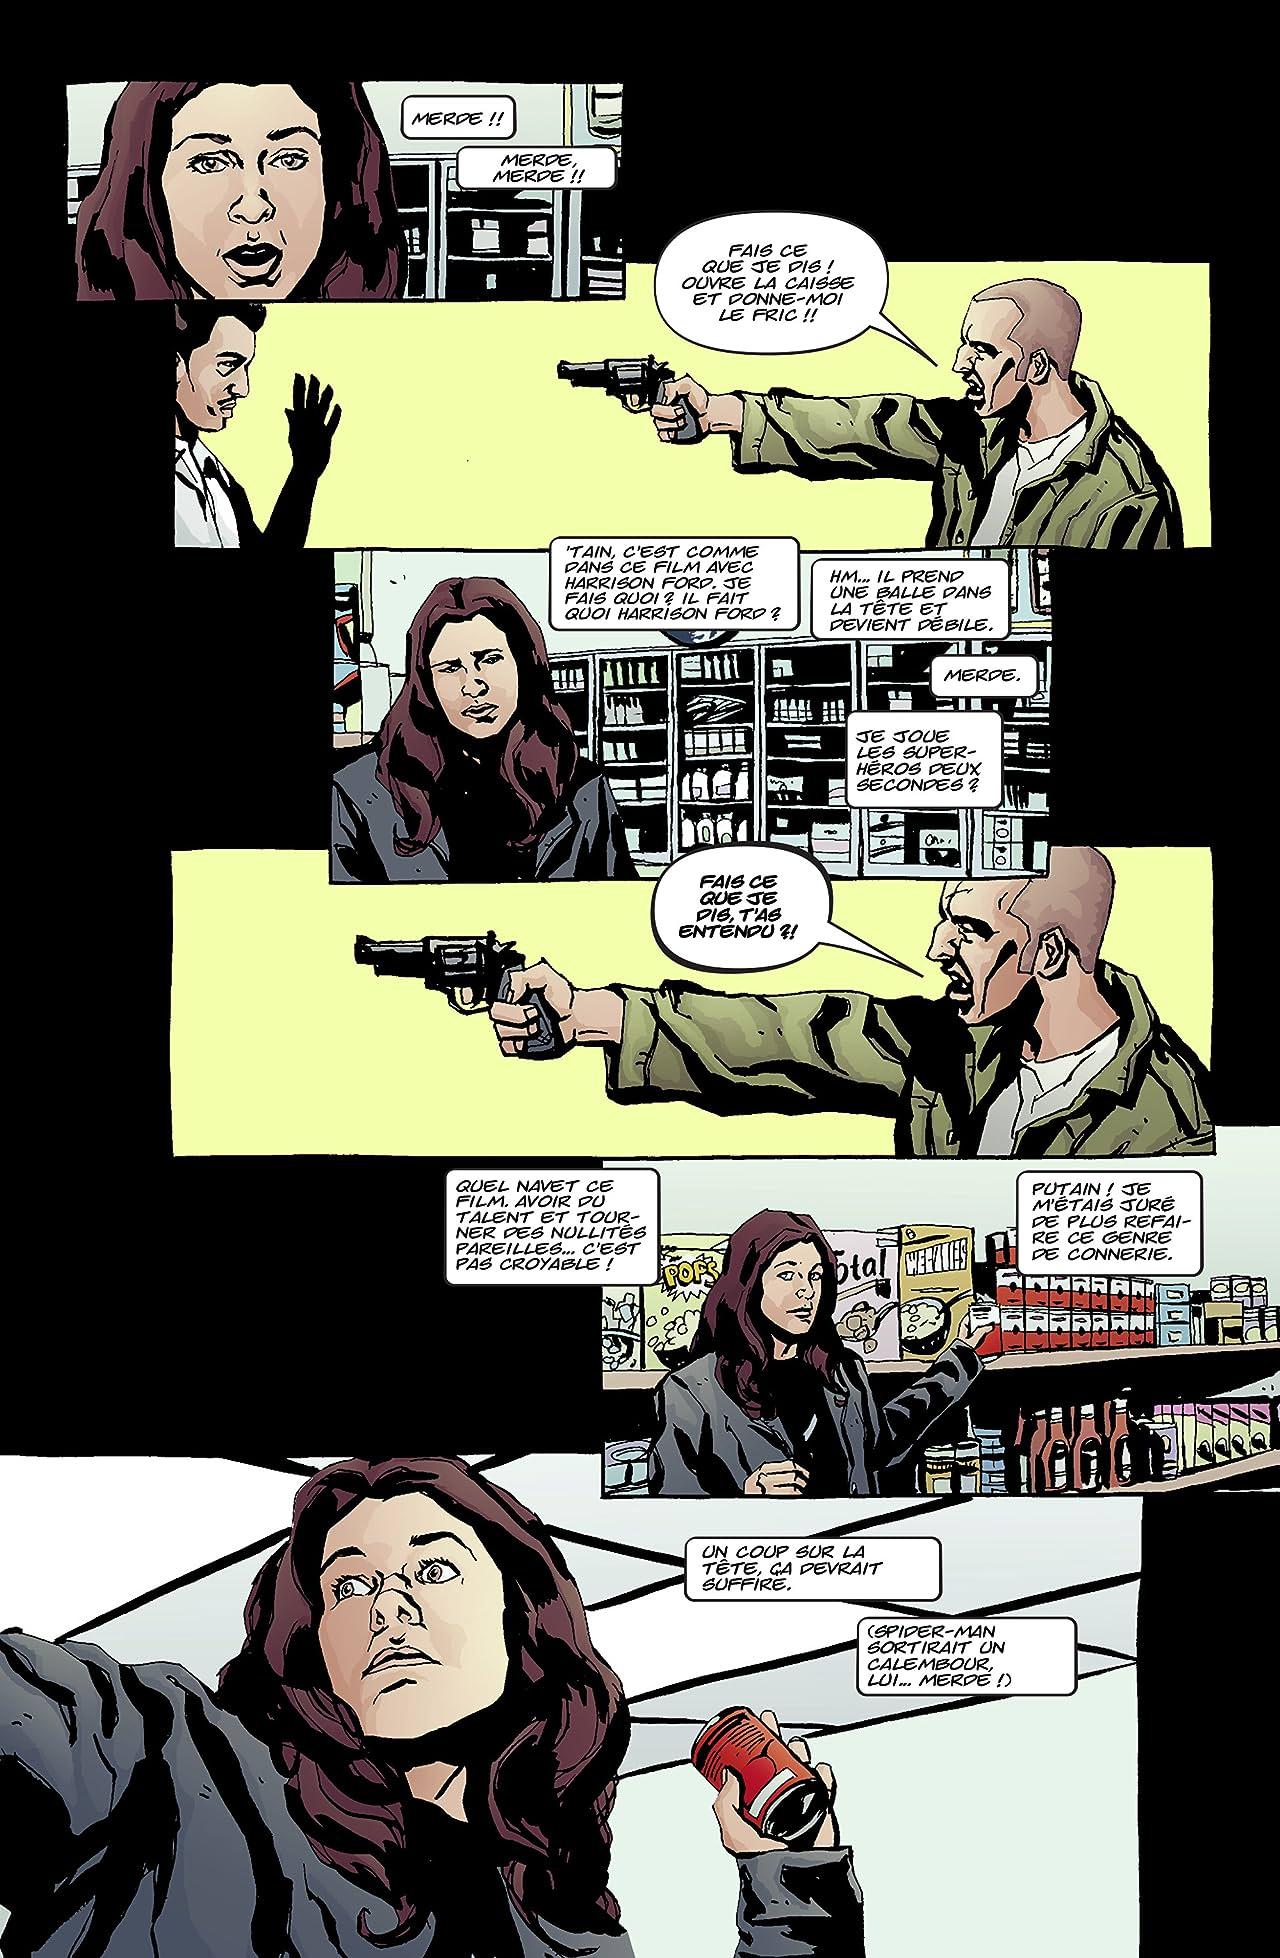 Jessica Jones: Alias Vol. 2: Pourpre